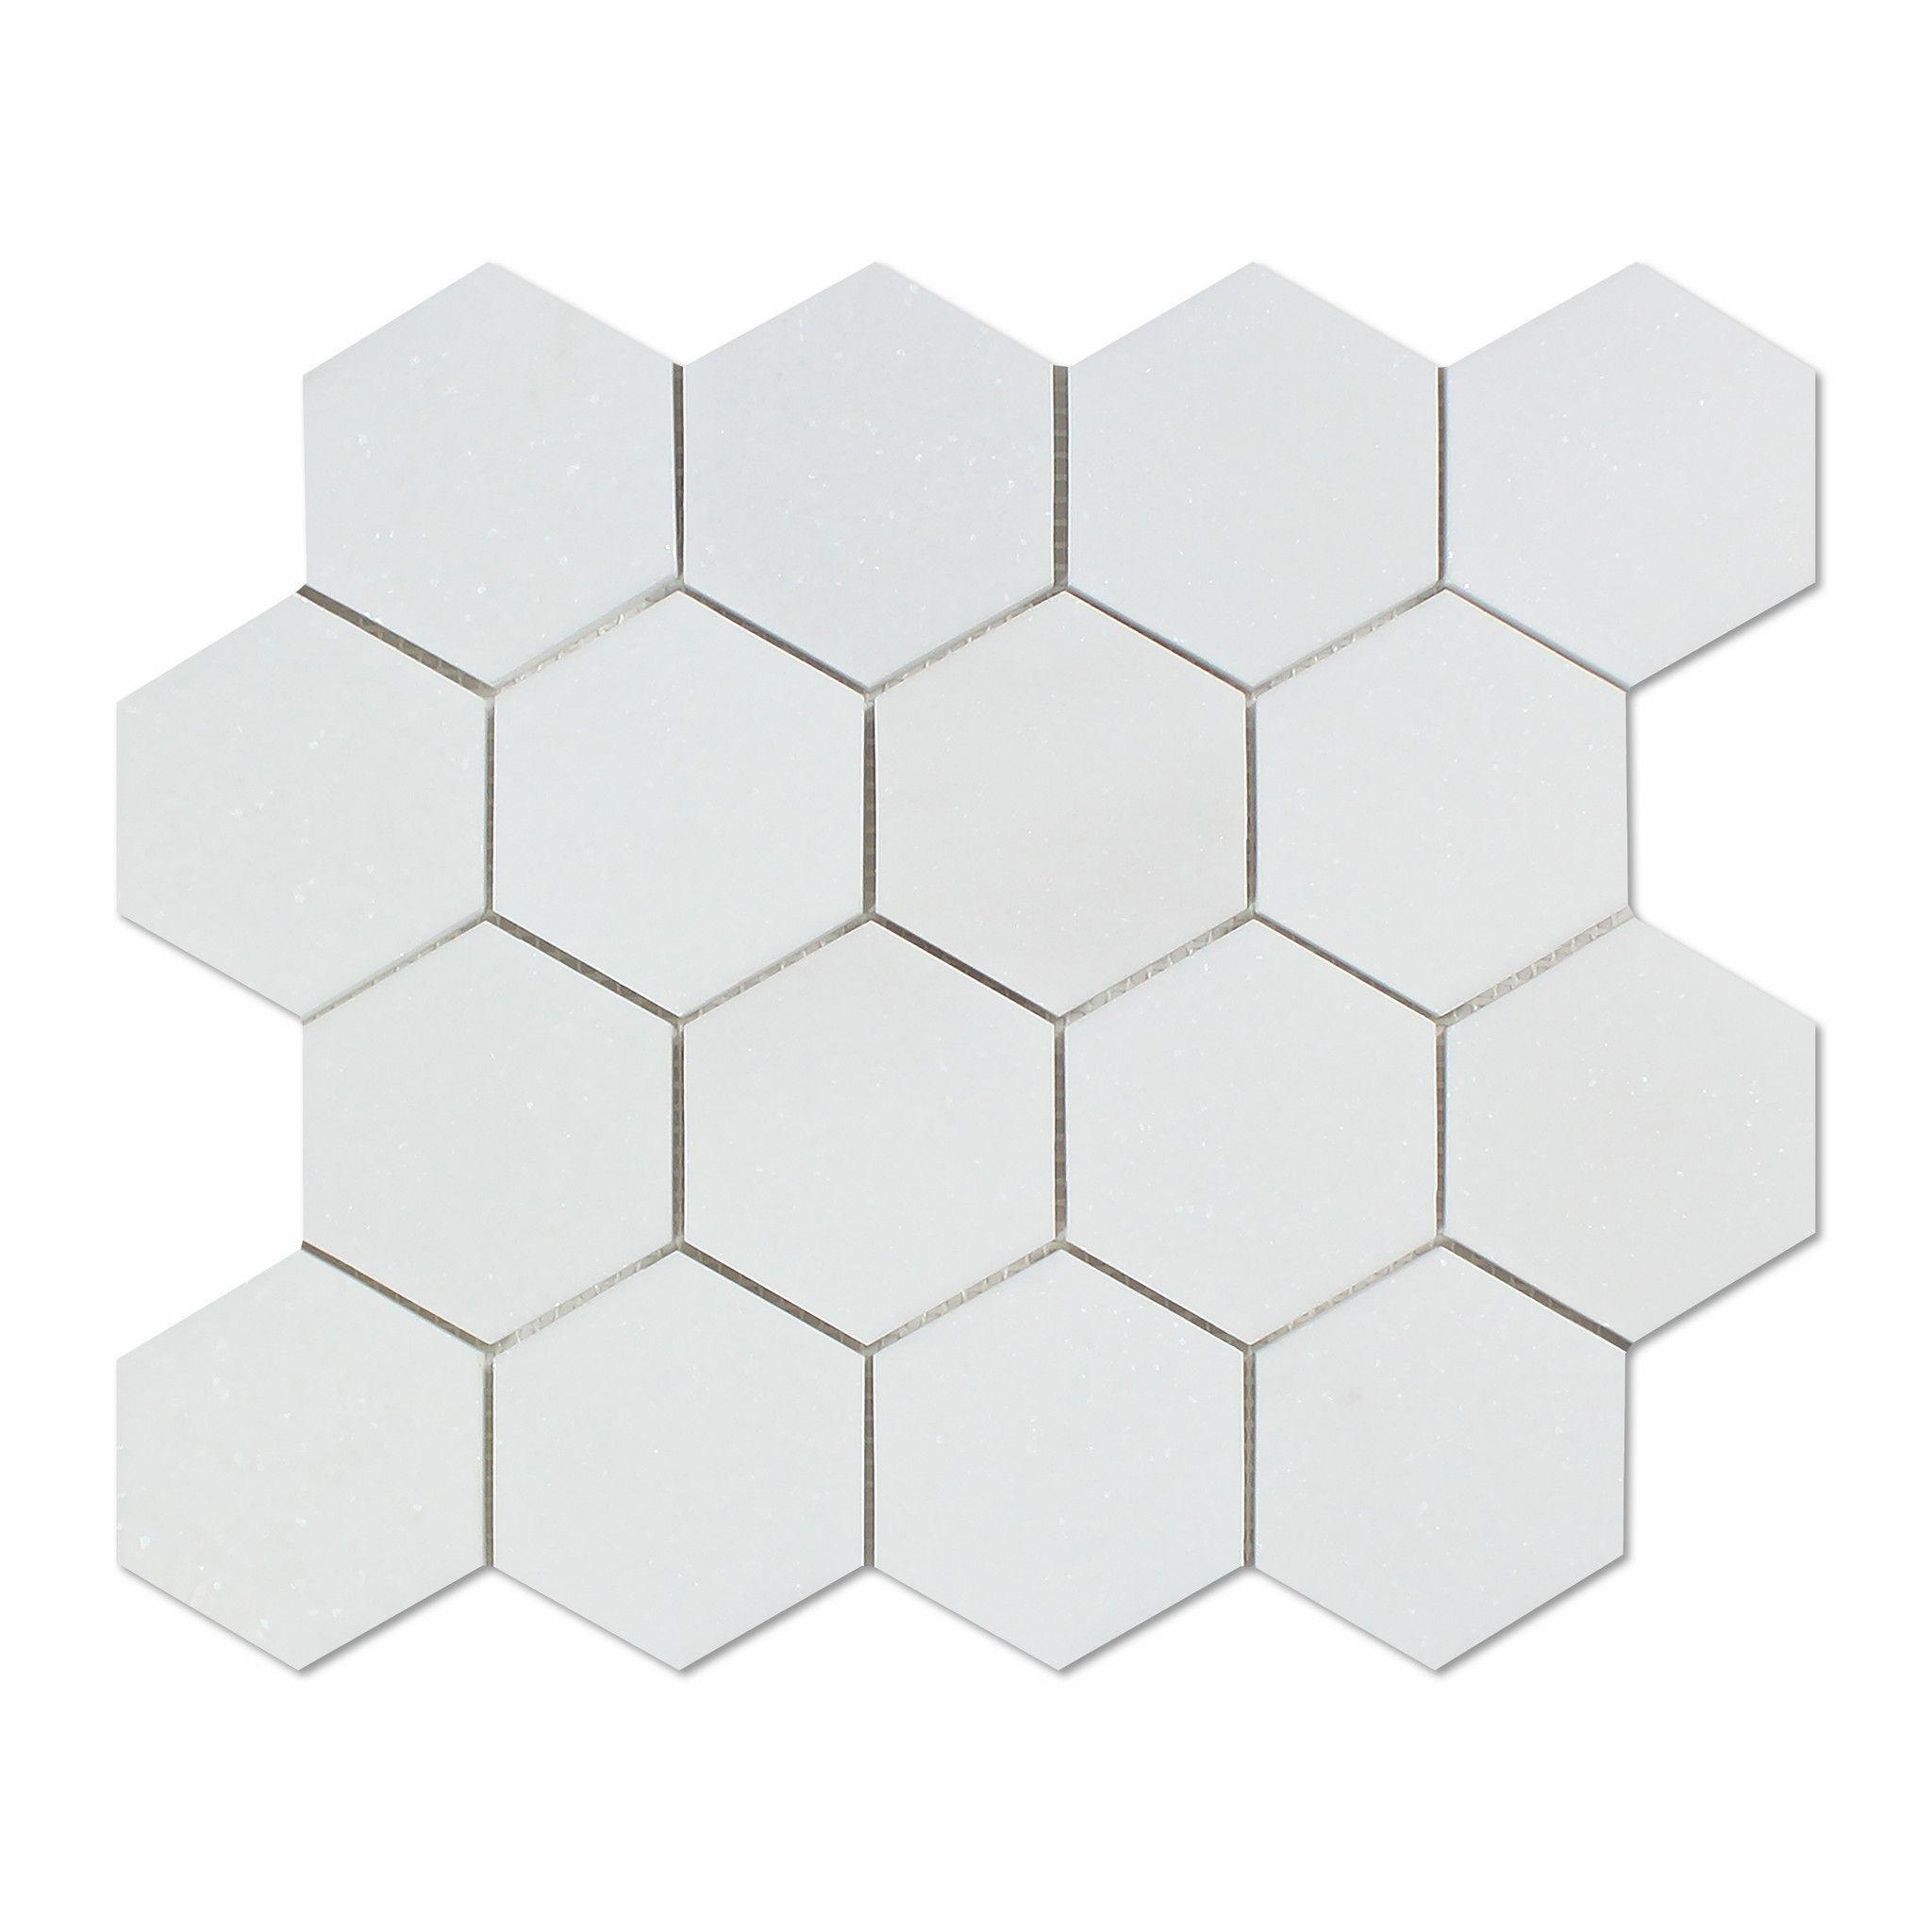 Thassos White Marble Honed 3 Hexagon Mosaic Tile Hexagon Mosaic